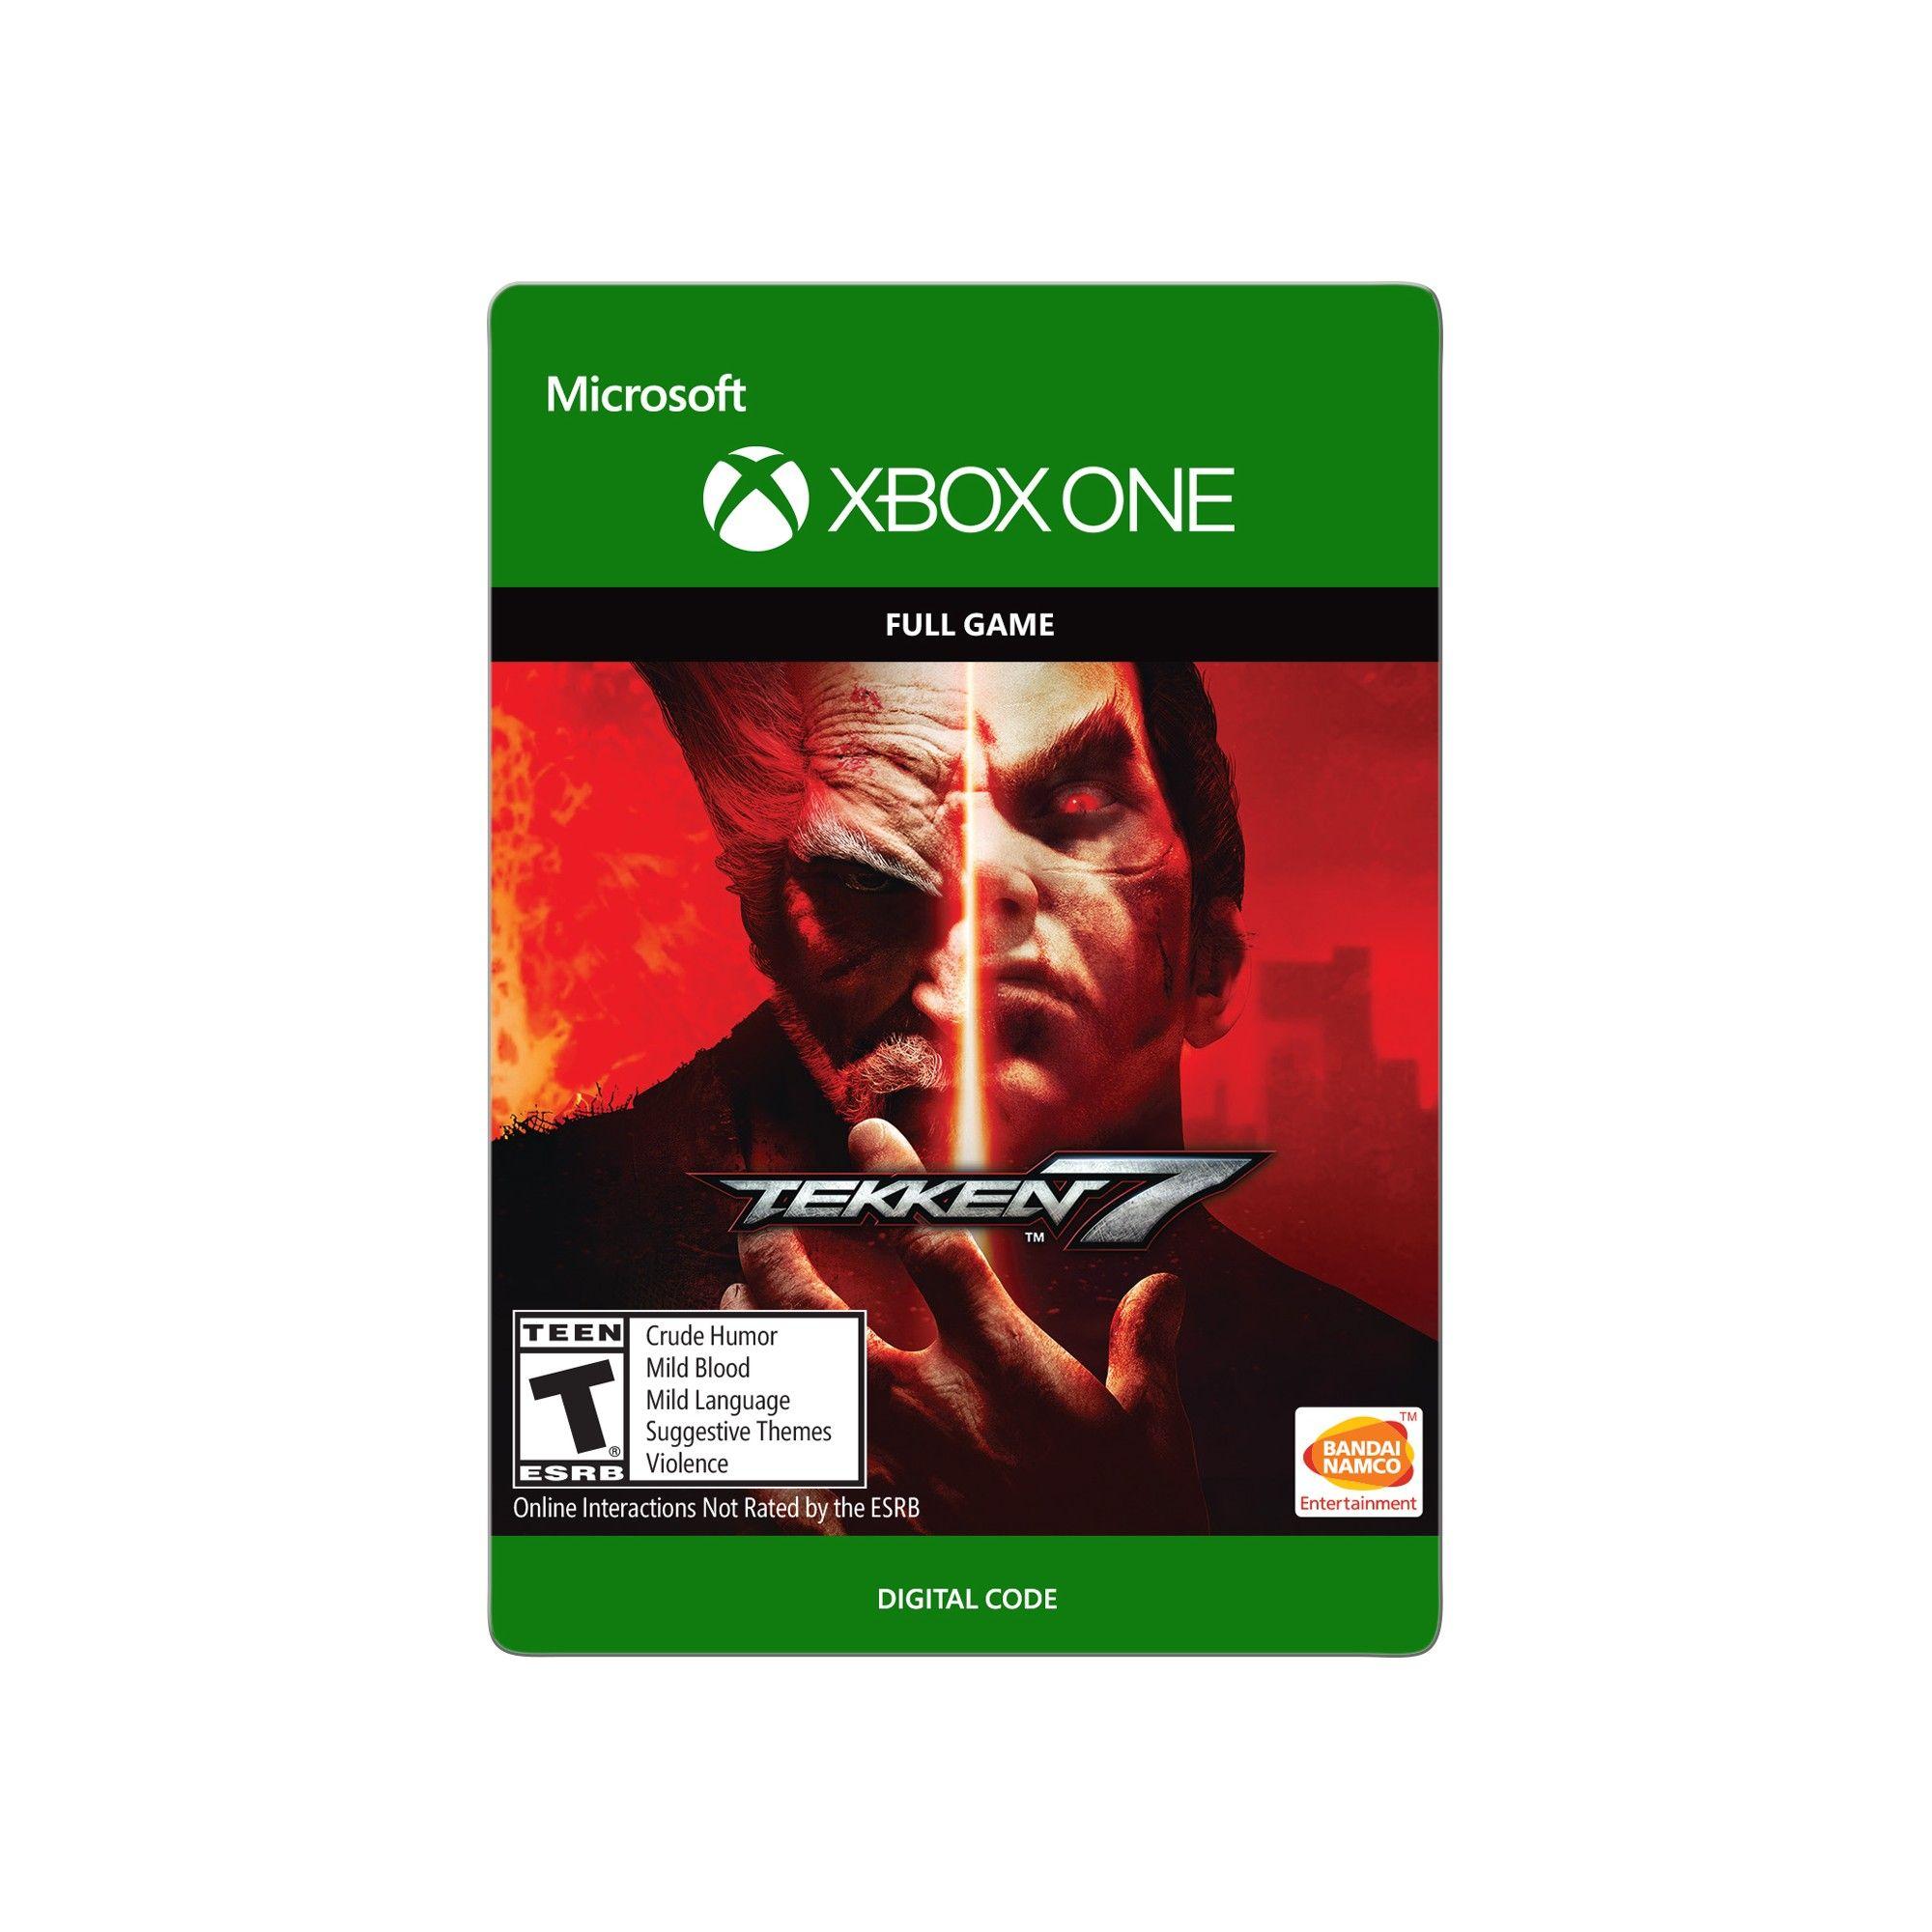 Xbox One Tekken 7 59.99 Email Delivery Tekken 7 xbox